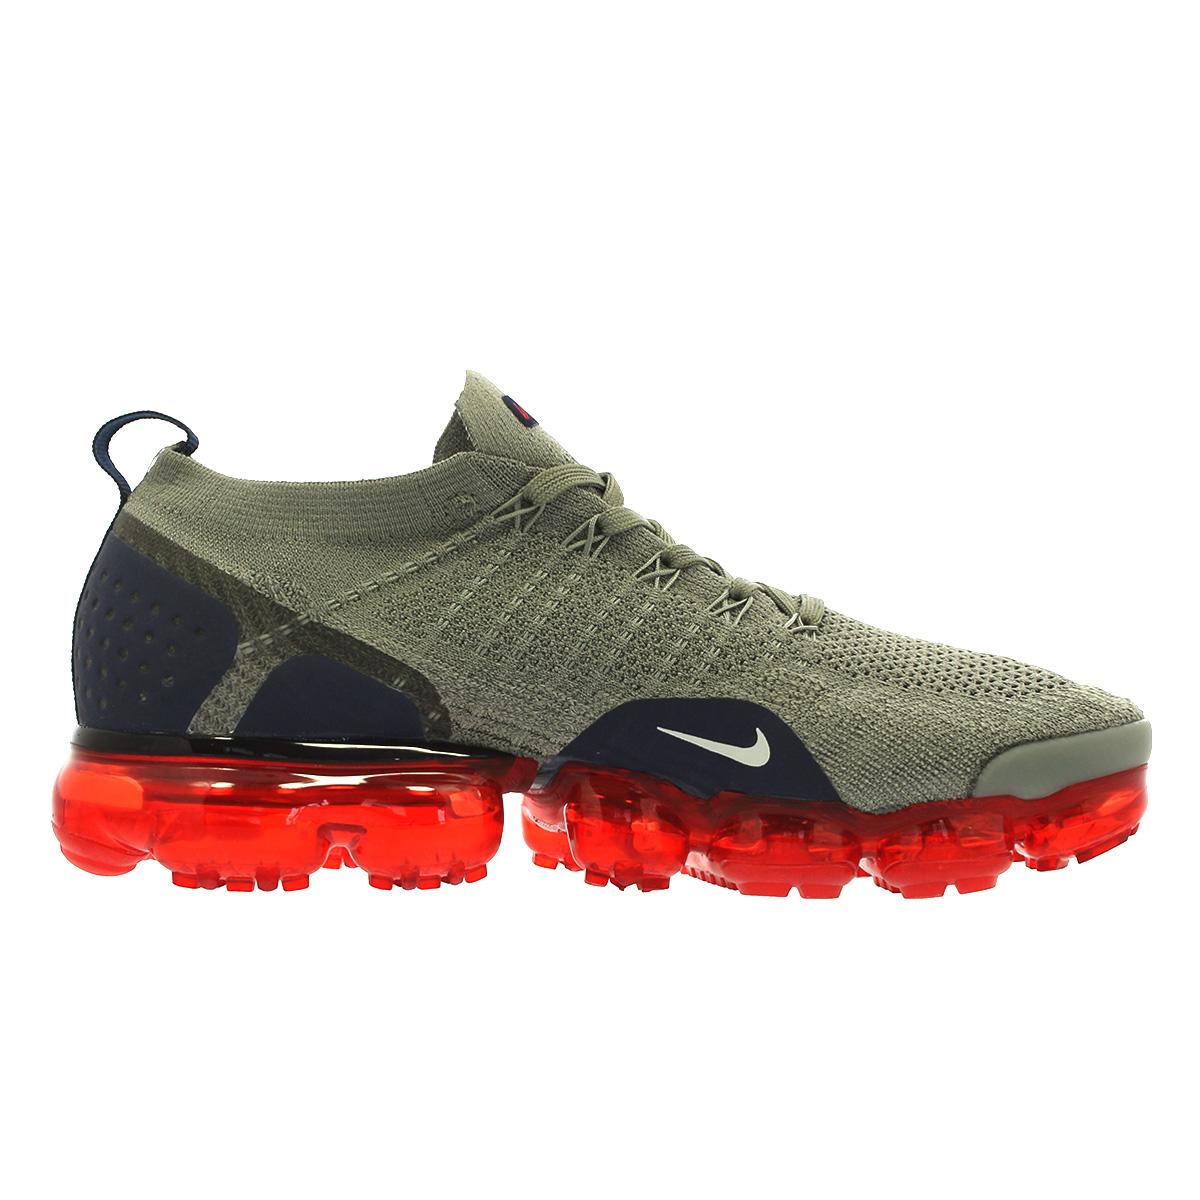 978e229fbf3 NIKE AIR VAPORMAX FLYKNIT 2 Nike vapor max fried food knit 2 DARK STUCCO GREY  FOG OBSIDIAN 942